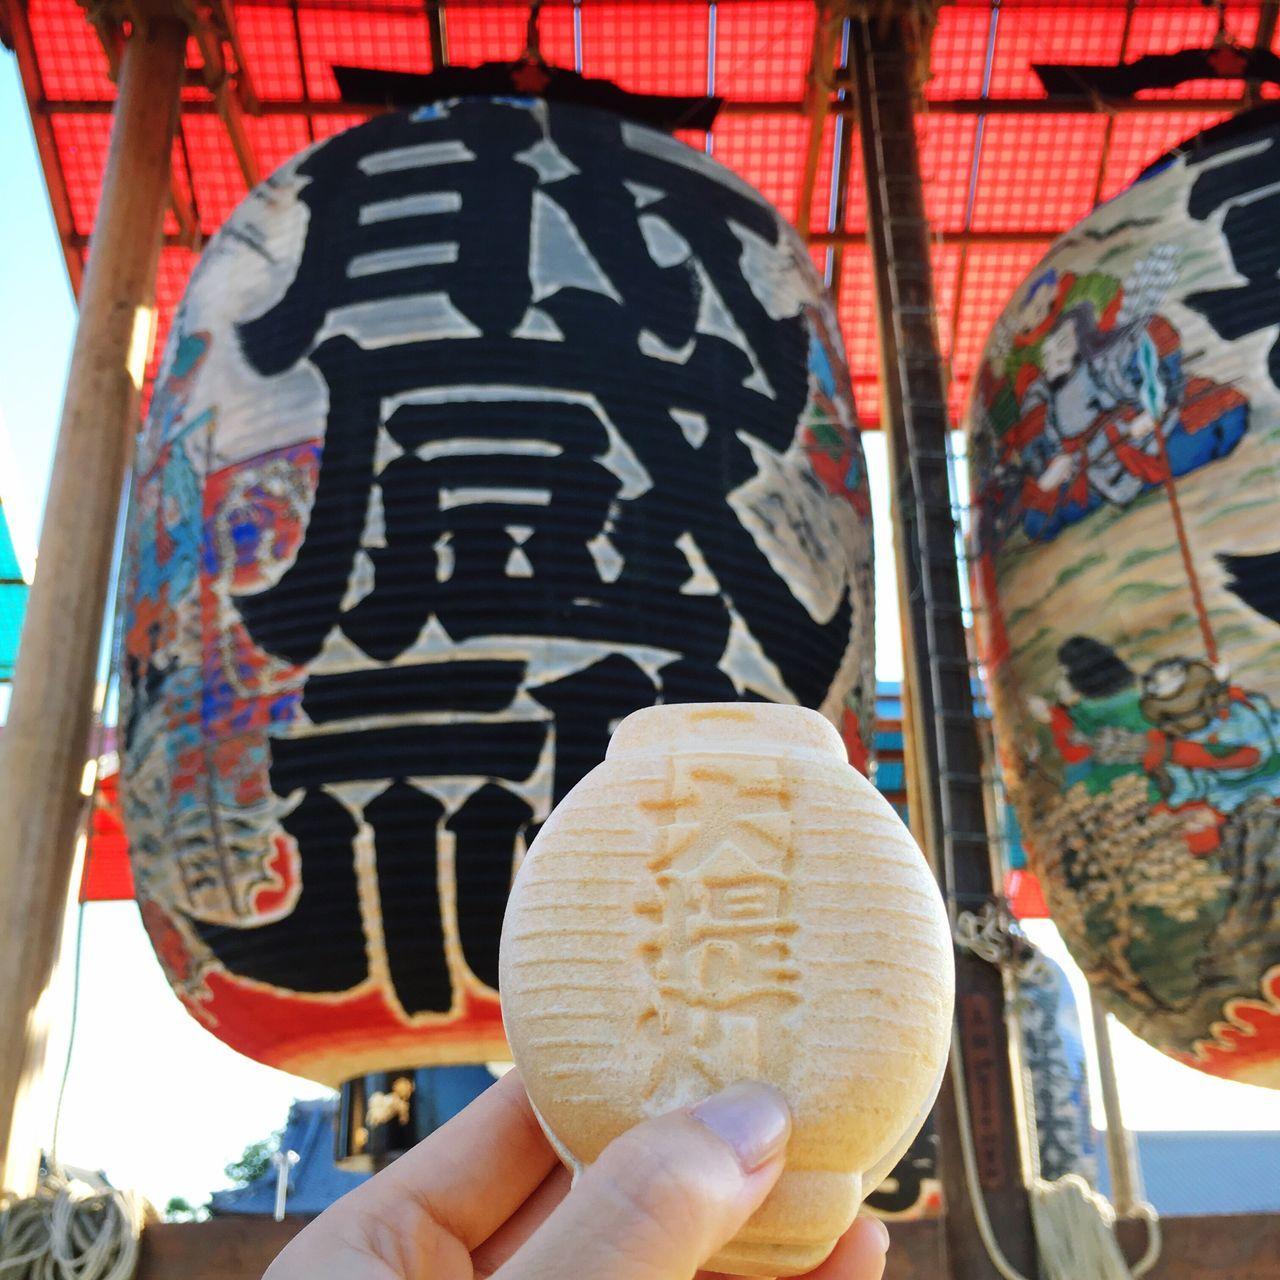 Traditional Culture Japan Shrine Wagashi Sweets BIG Japonism Lantern Festival